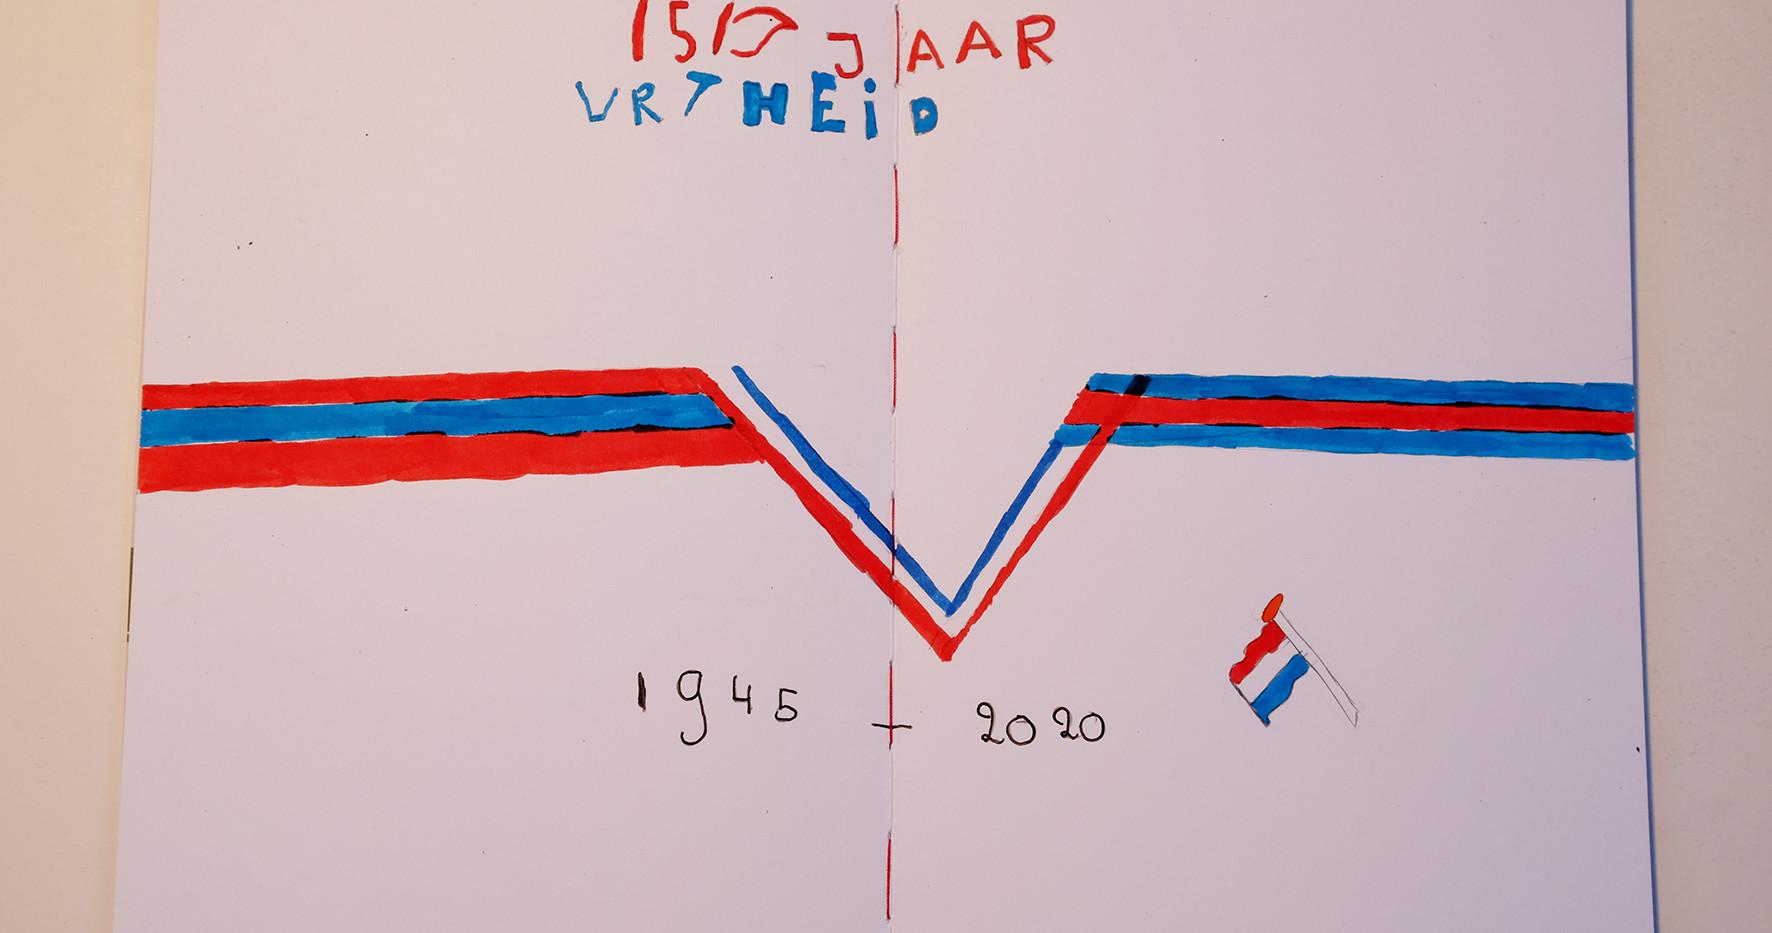 285 Vera Wijnen TK1E.JPG